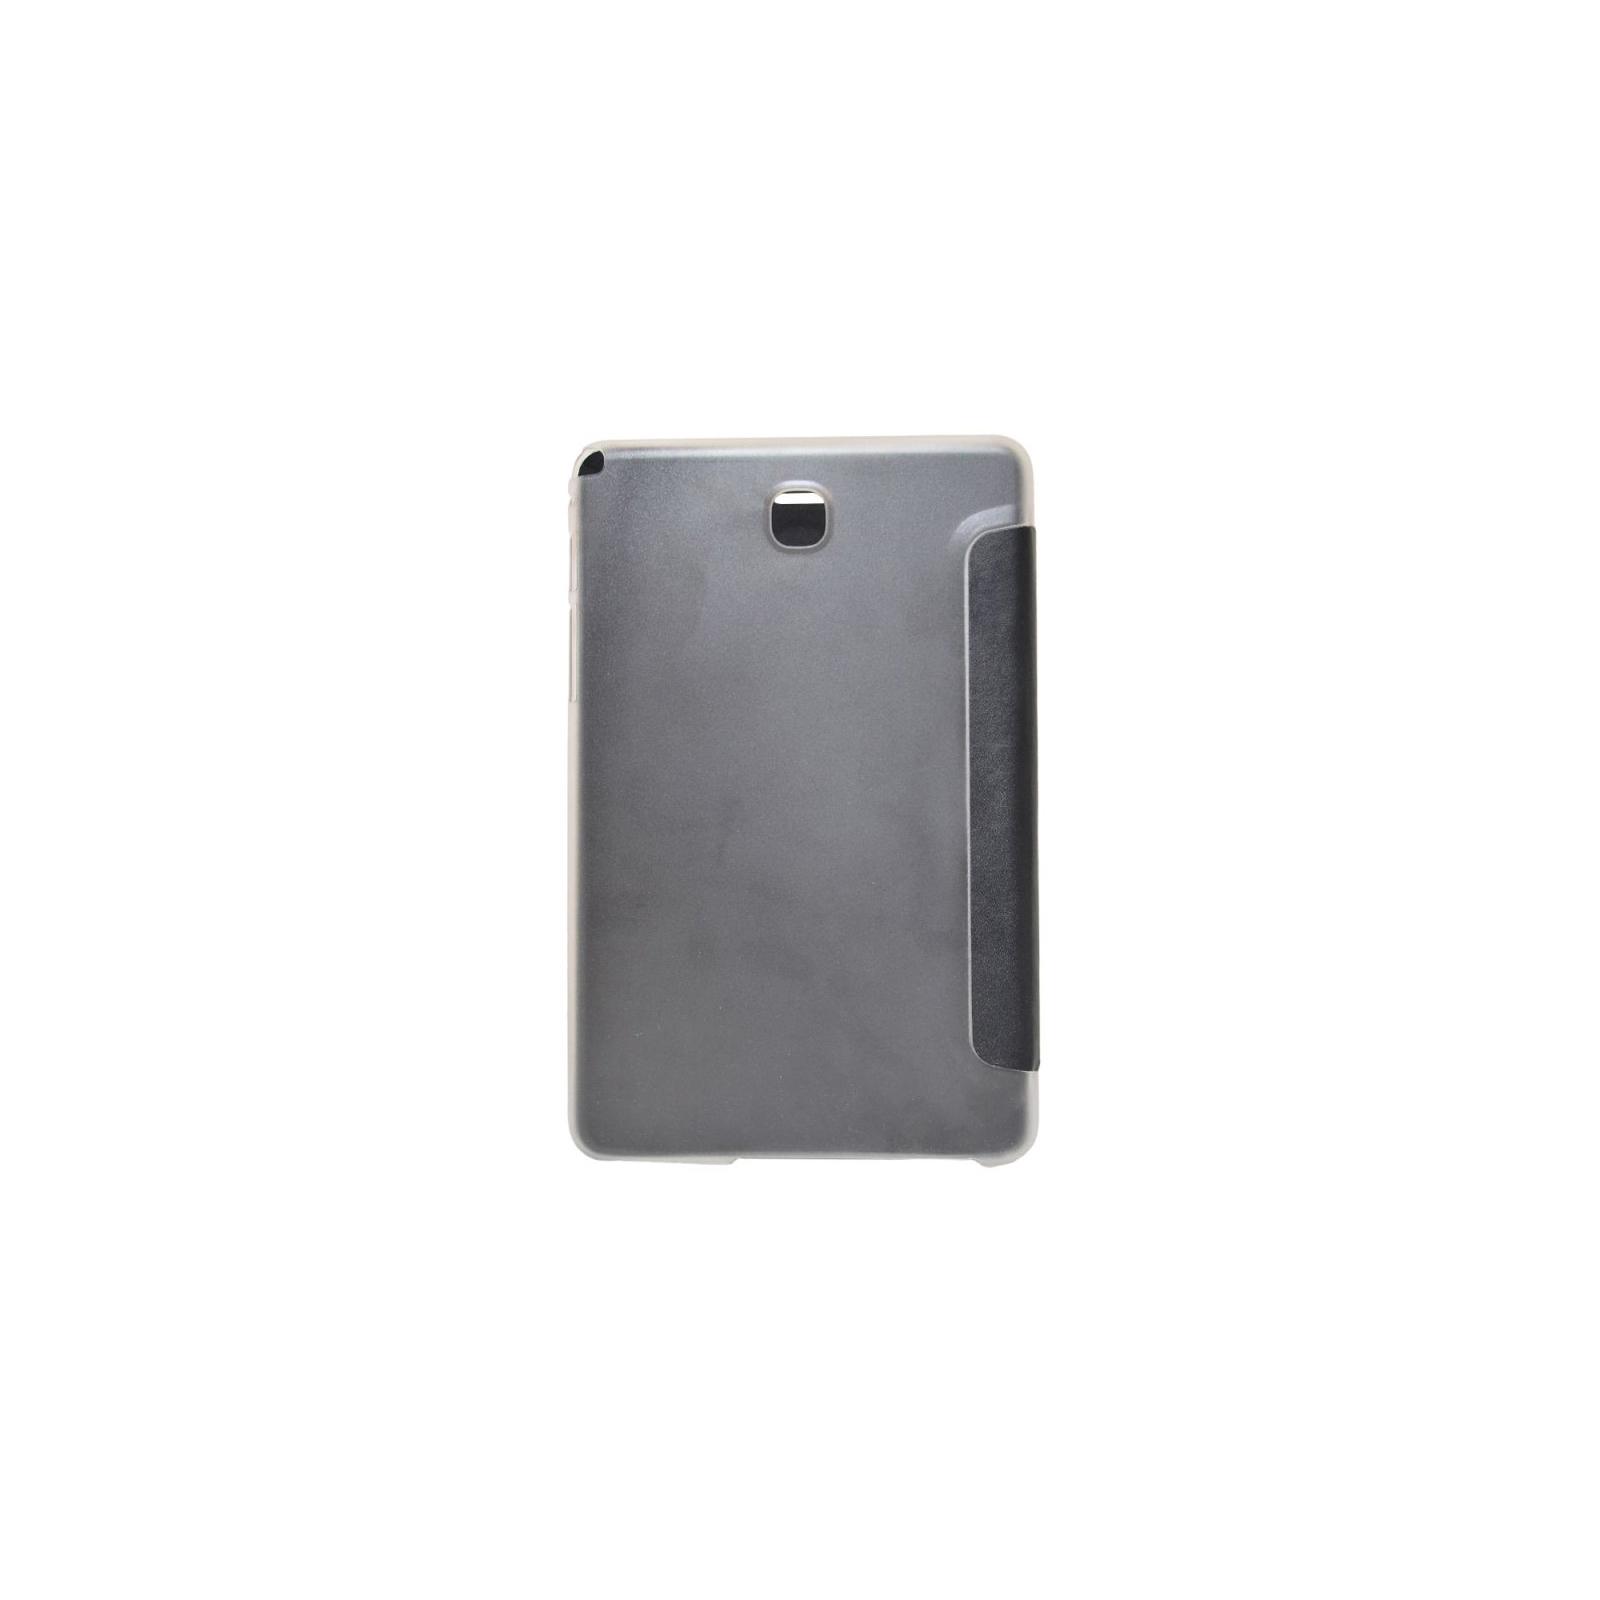 "Чехол для планшета Pro-case 8"" TFC Samsung T350/355(Tab A) Black (PCTFCT350Bl) изображение 2"